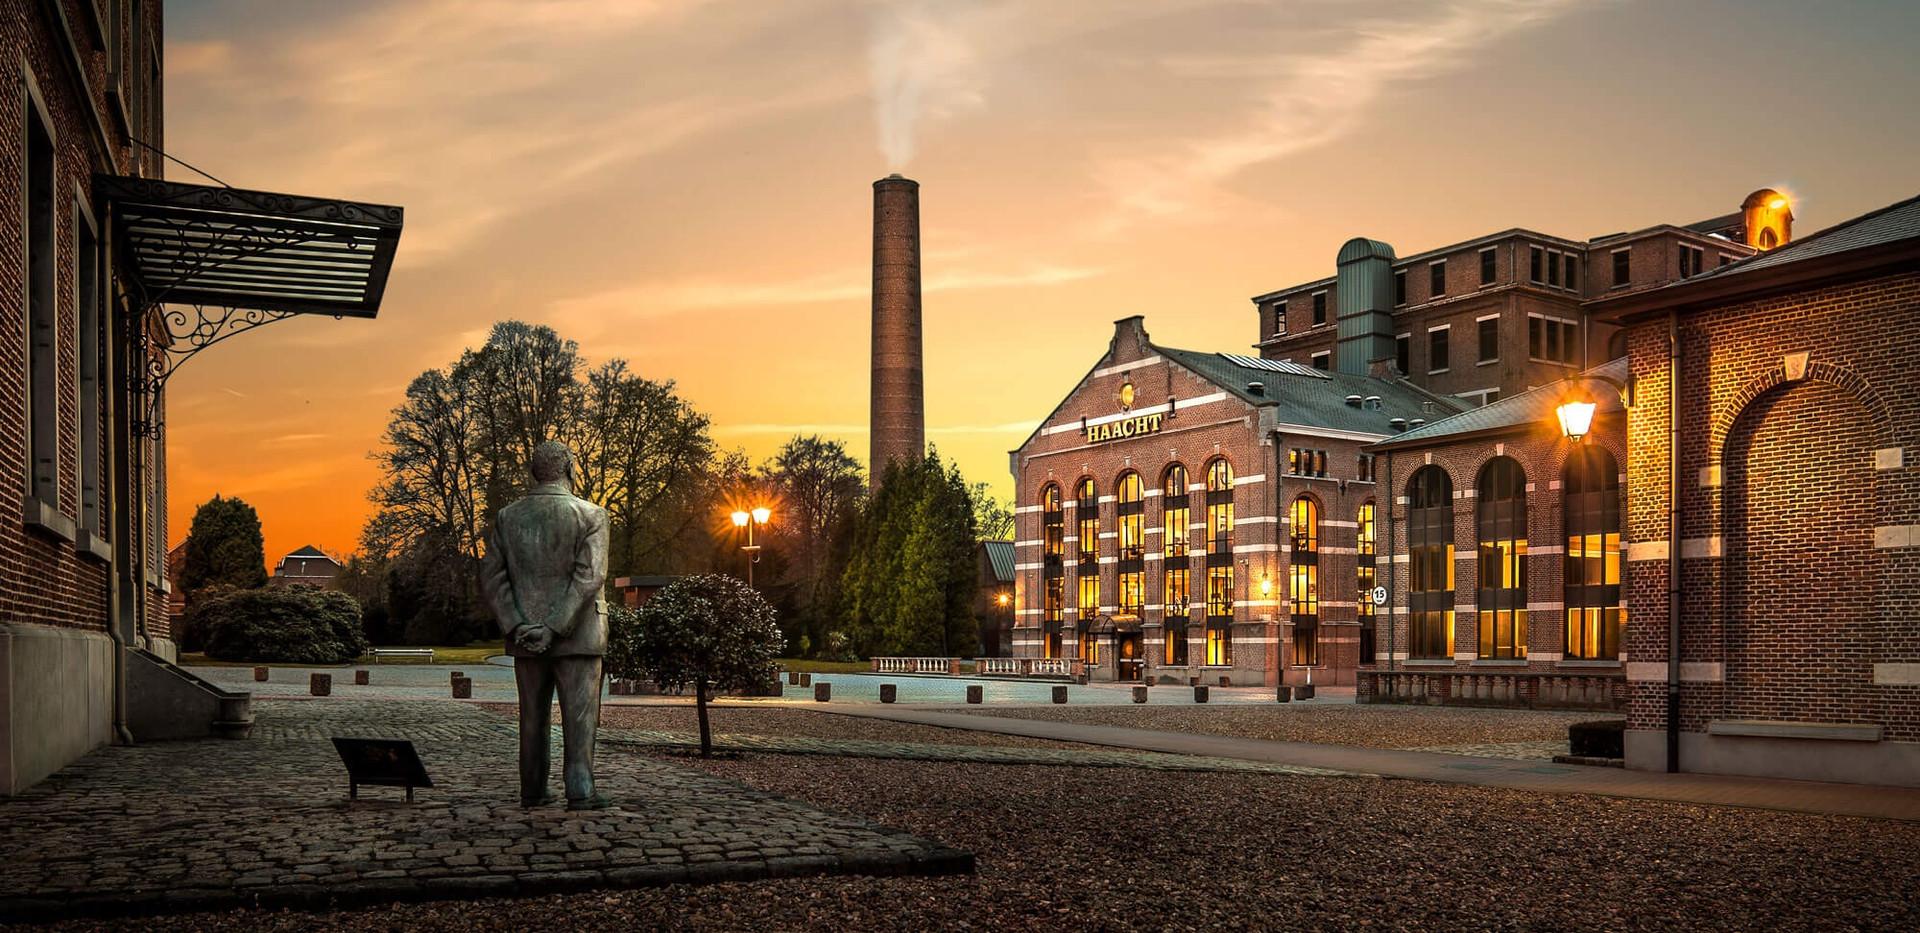 Brouwerij Haacht by night.jpg